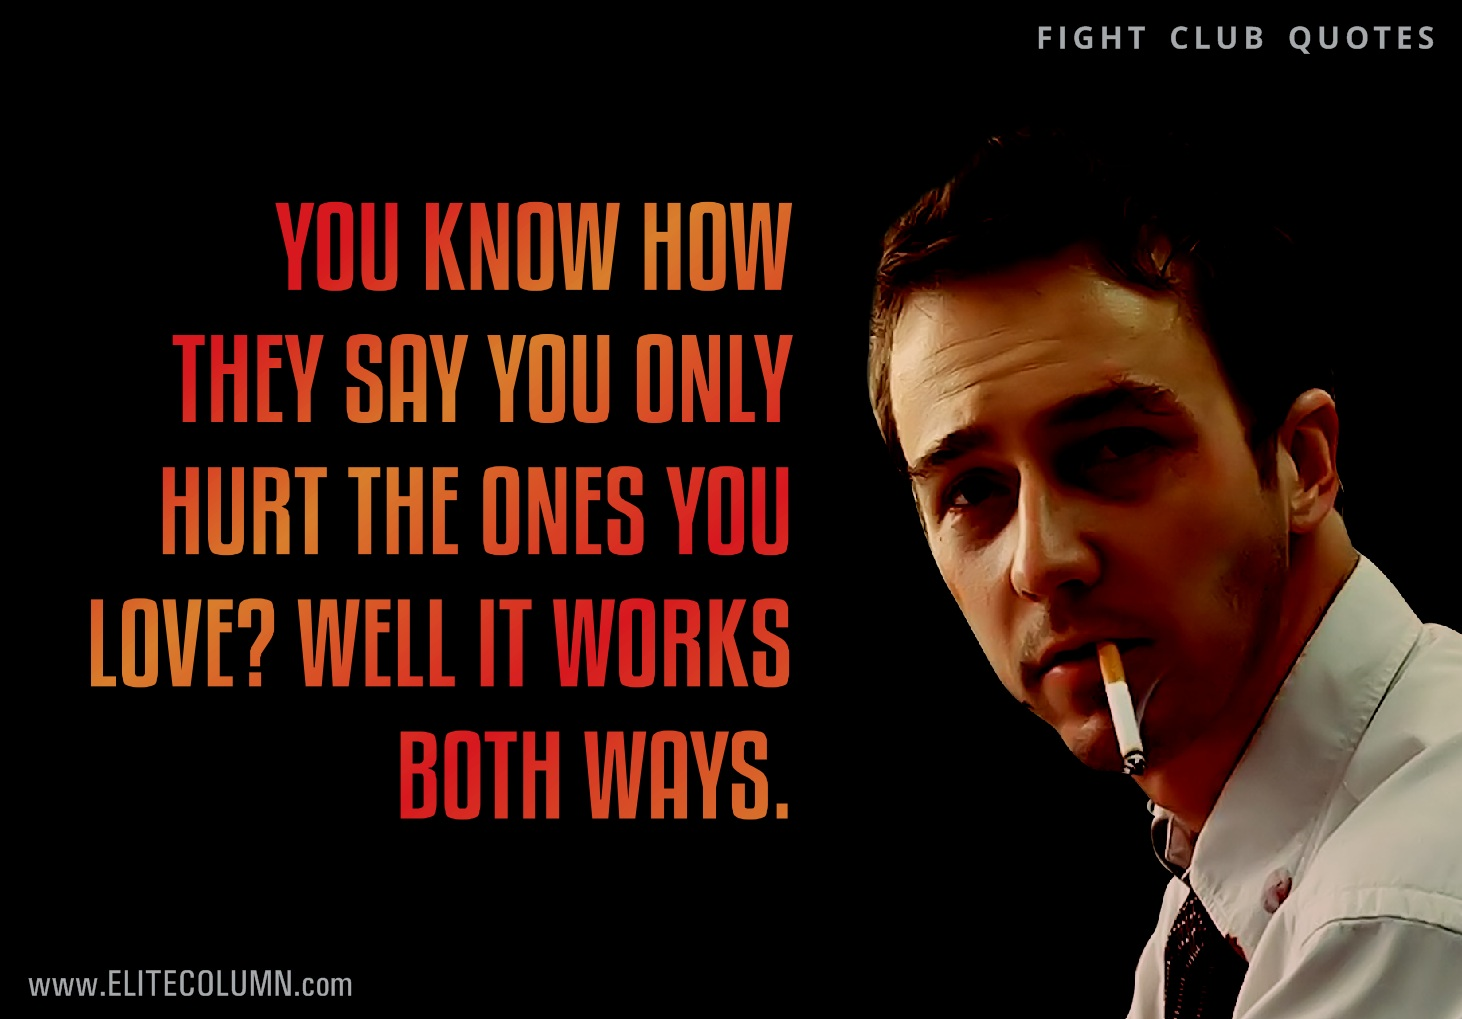 Fight Club Quotes 6 | EliteColumn